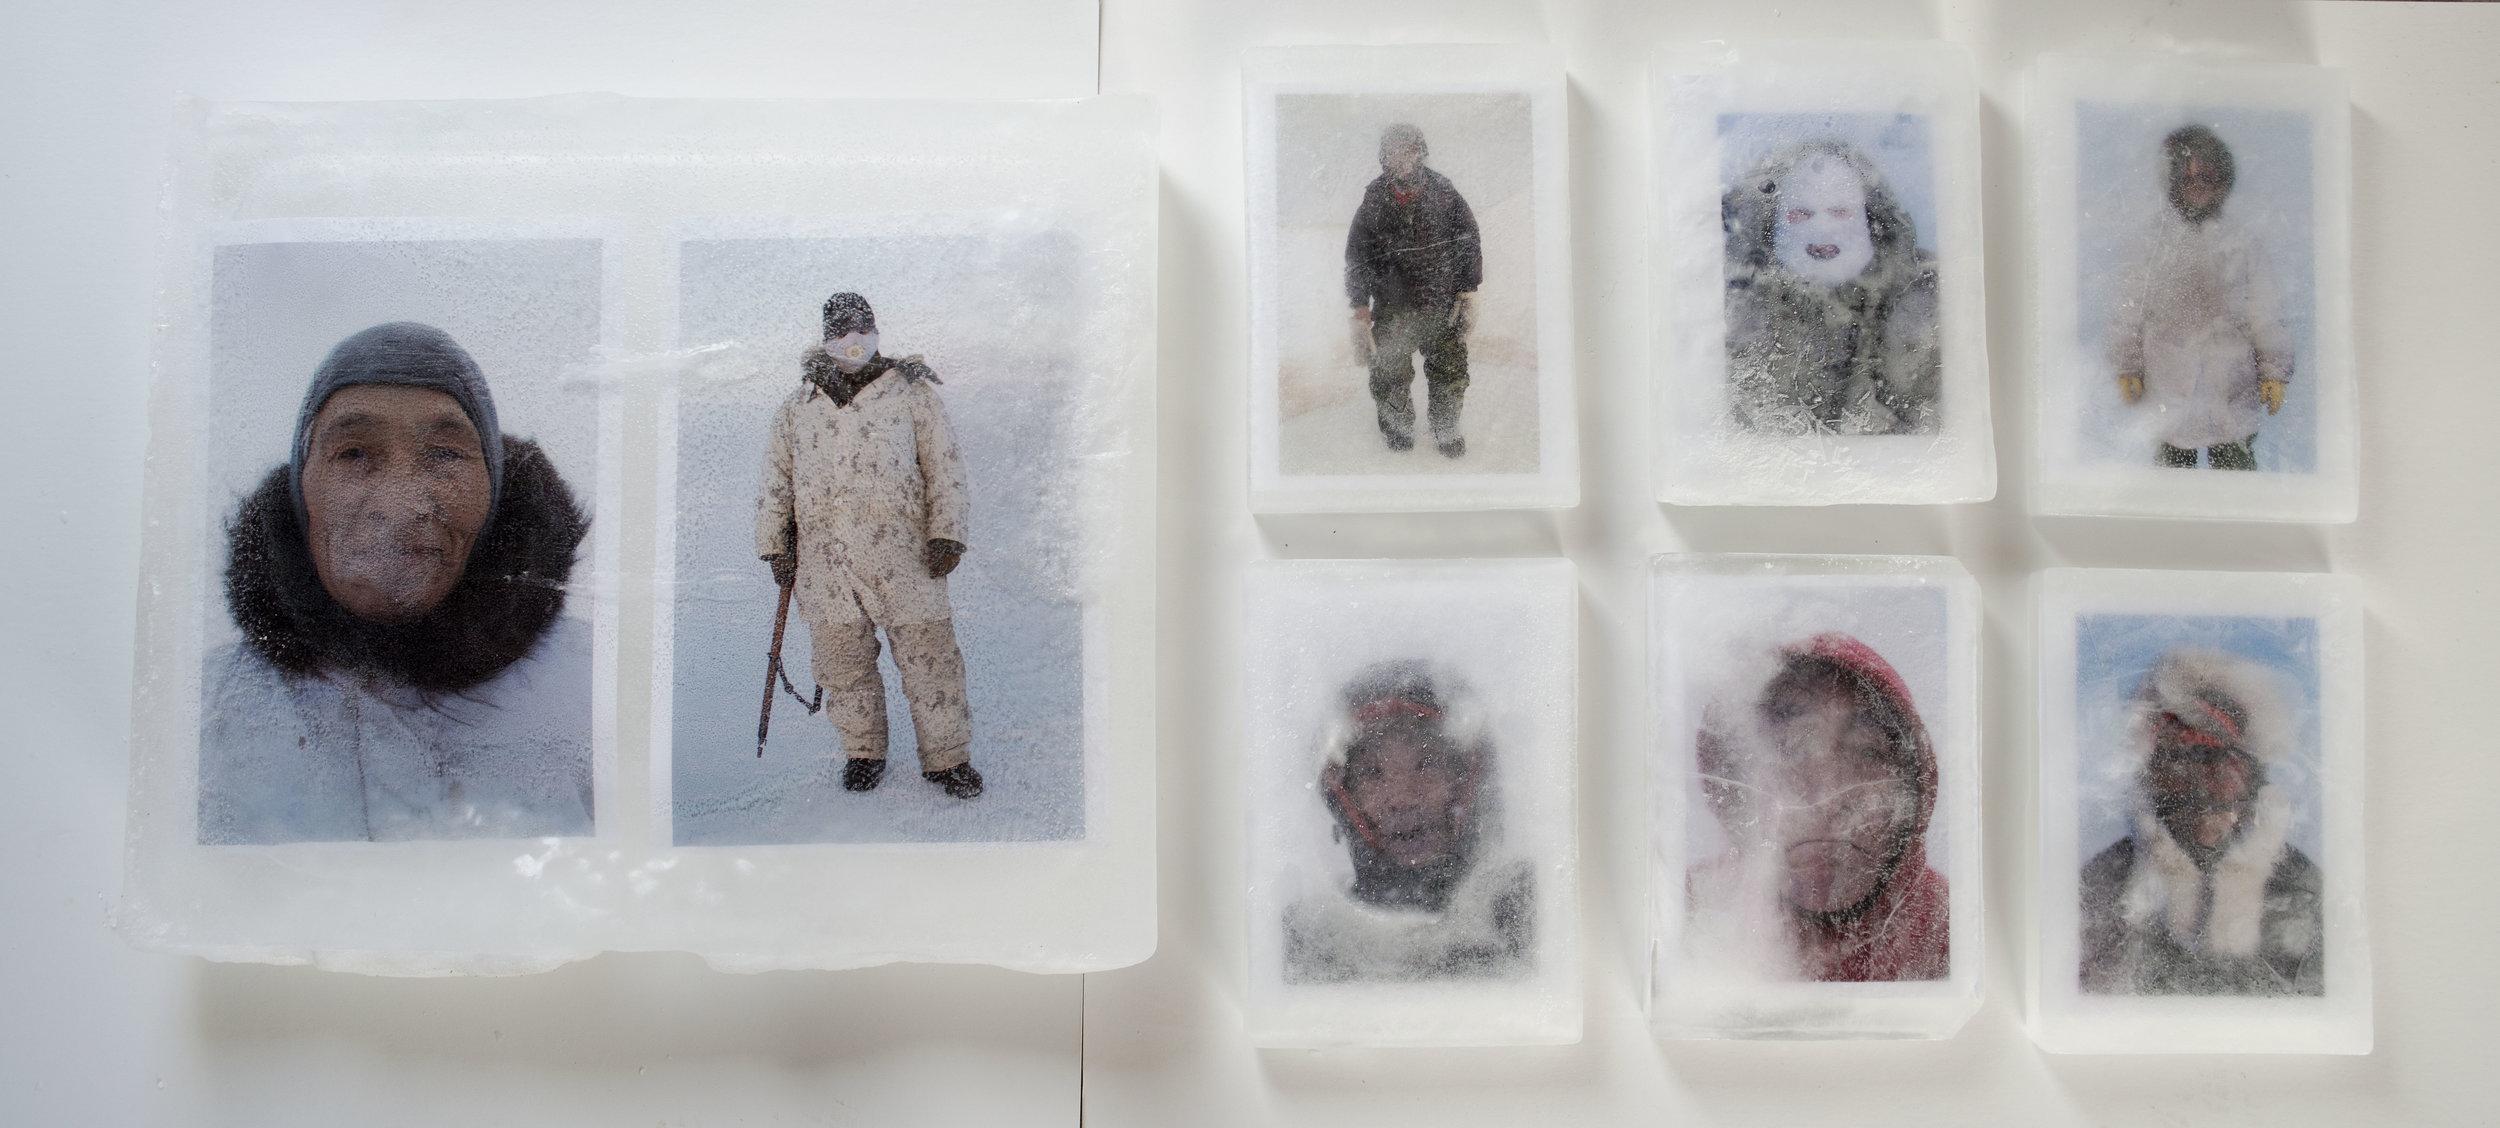 Arctic Passage  Installation by Louie Palu